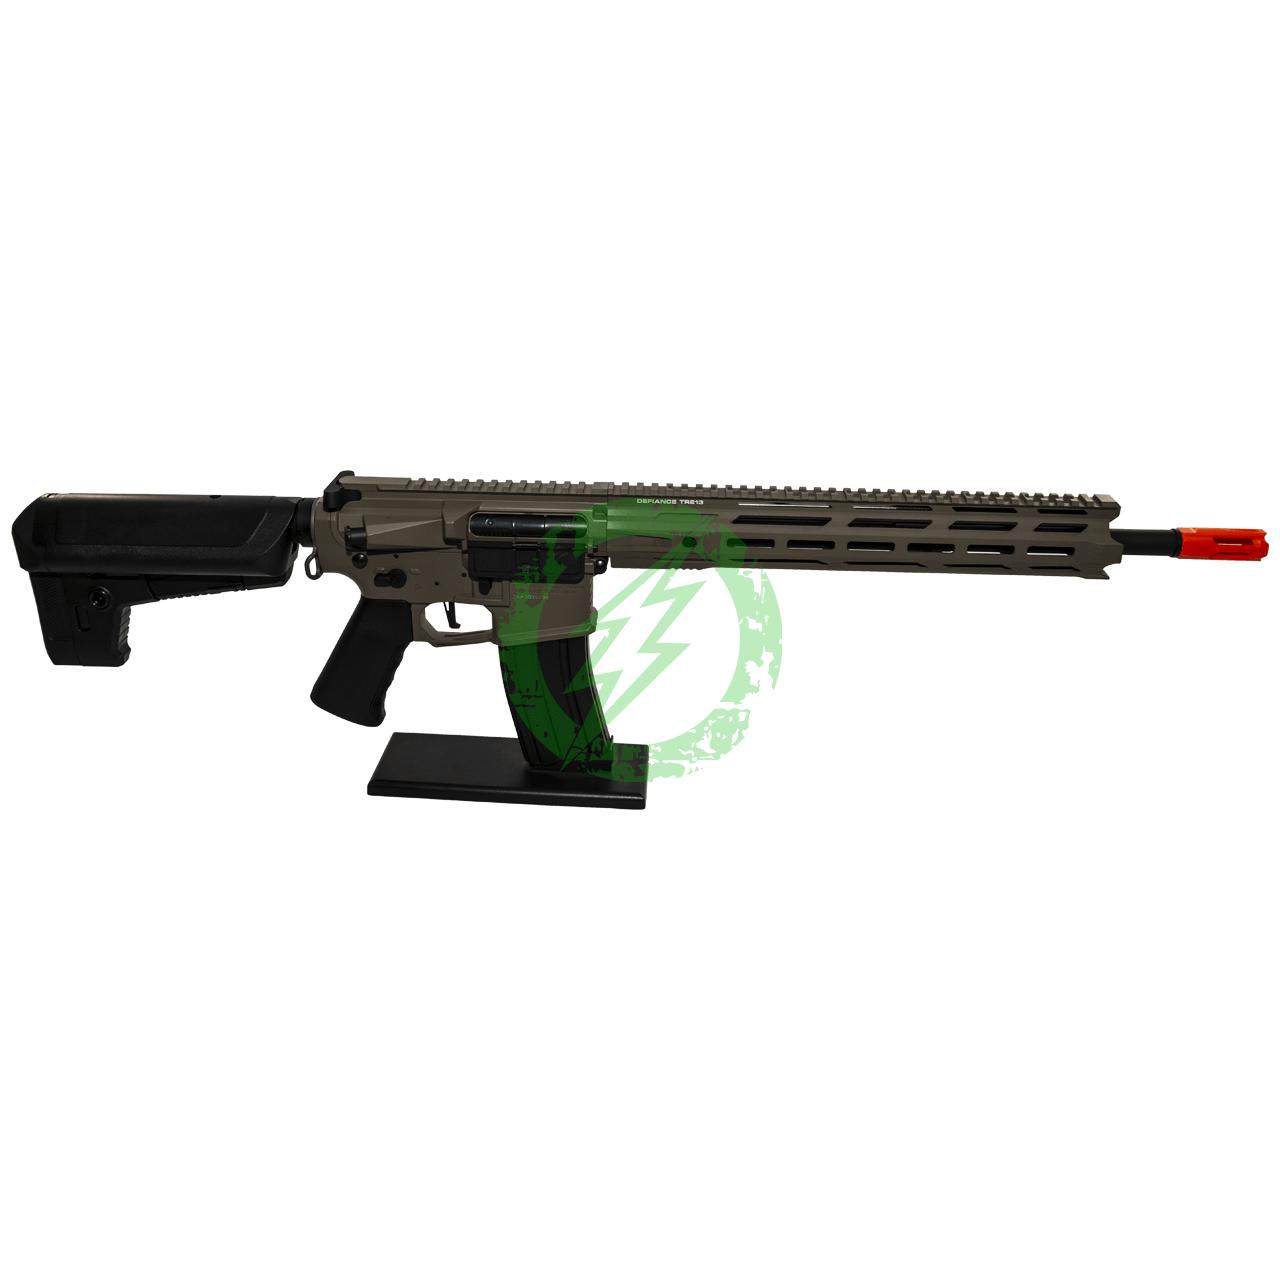 Amped Custom HPA Rifle Krytac MKII-M SPR | Flat Dark Earth Right Side